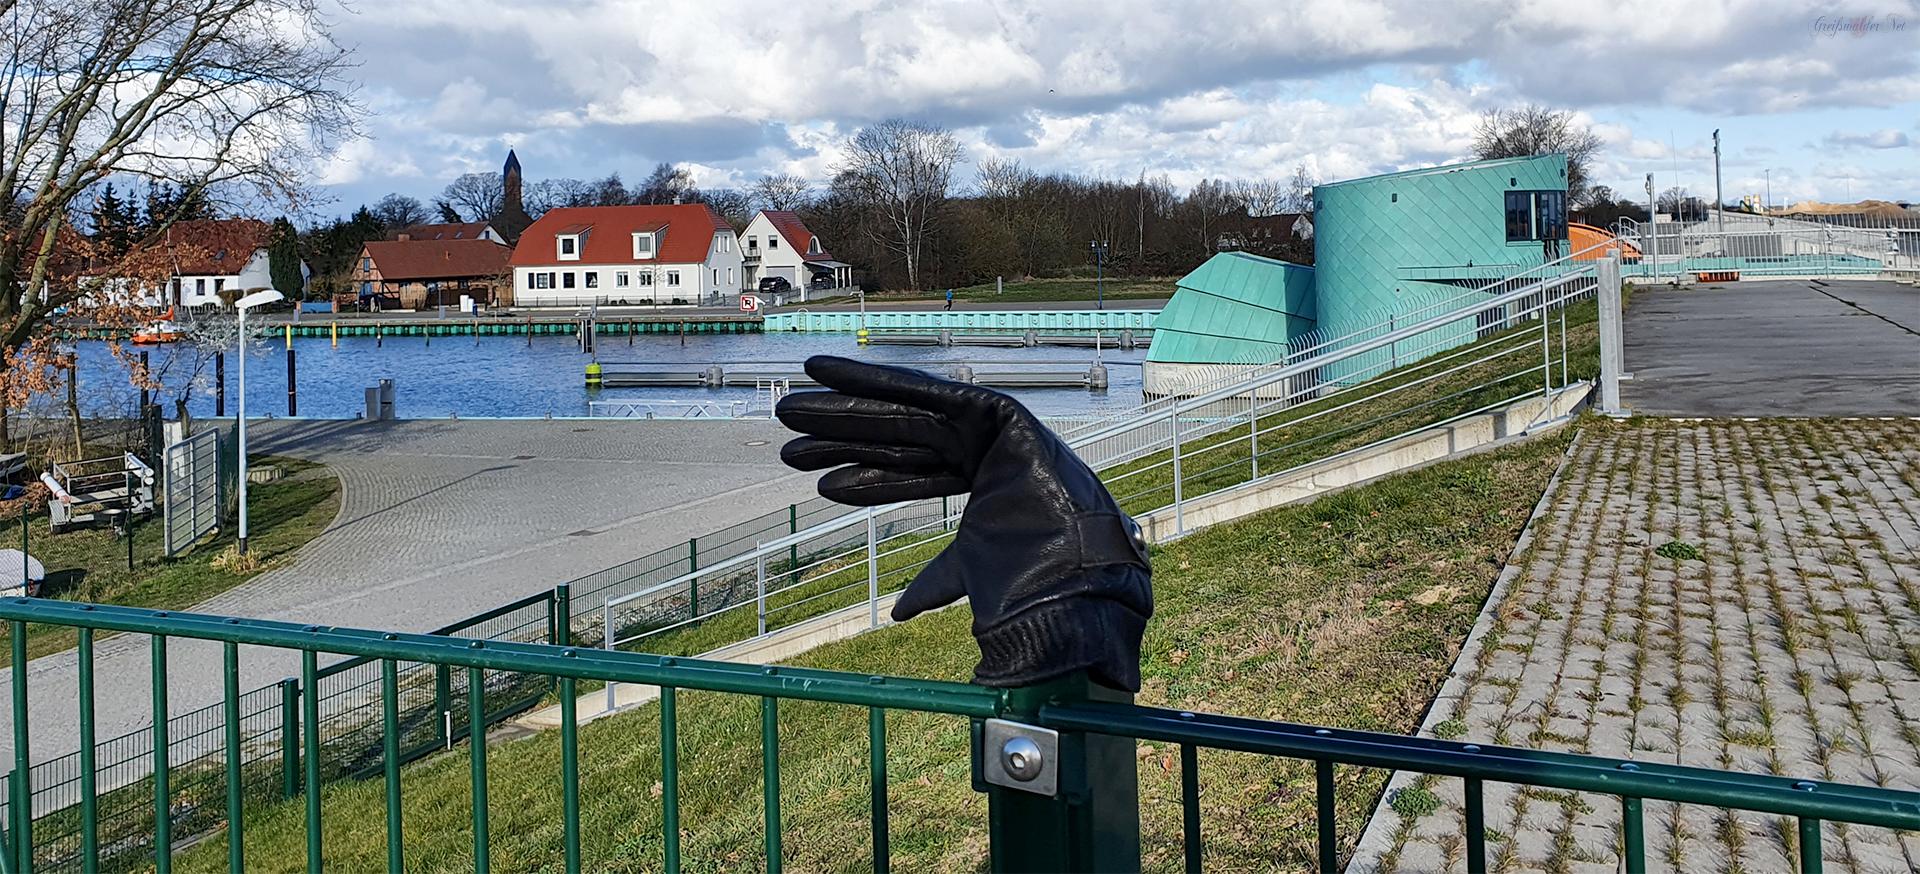 Lost in Greifswald-Wieck - verlorener Handschuh am Sperrwerk